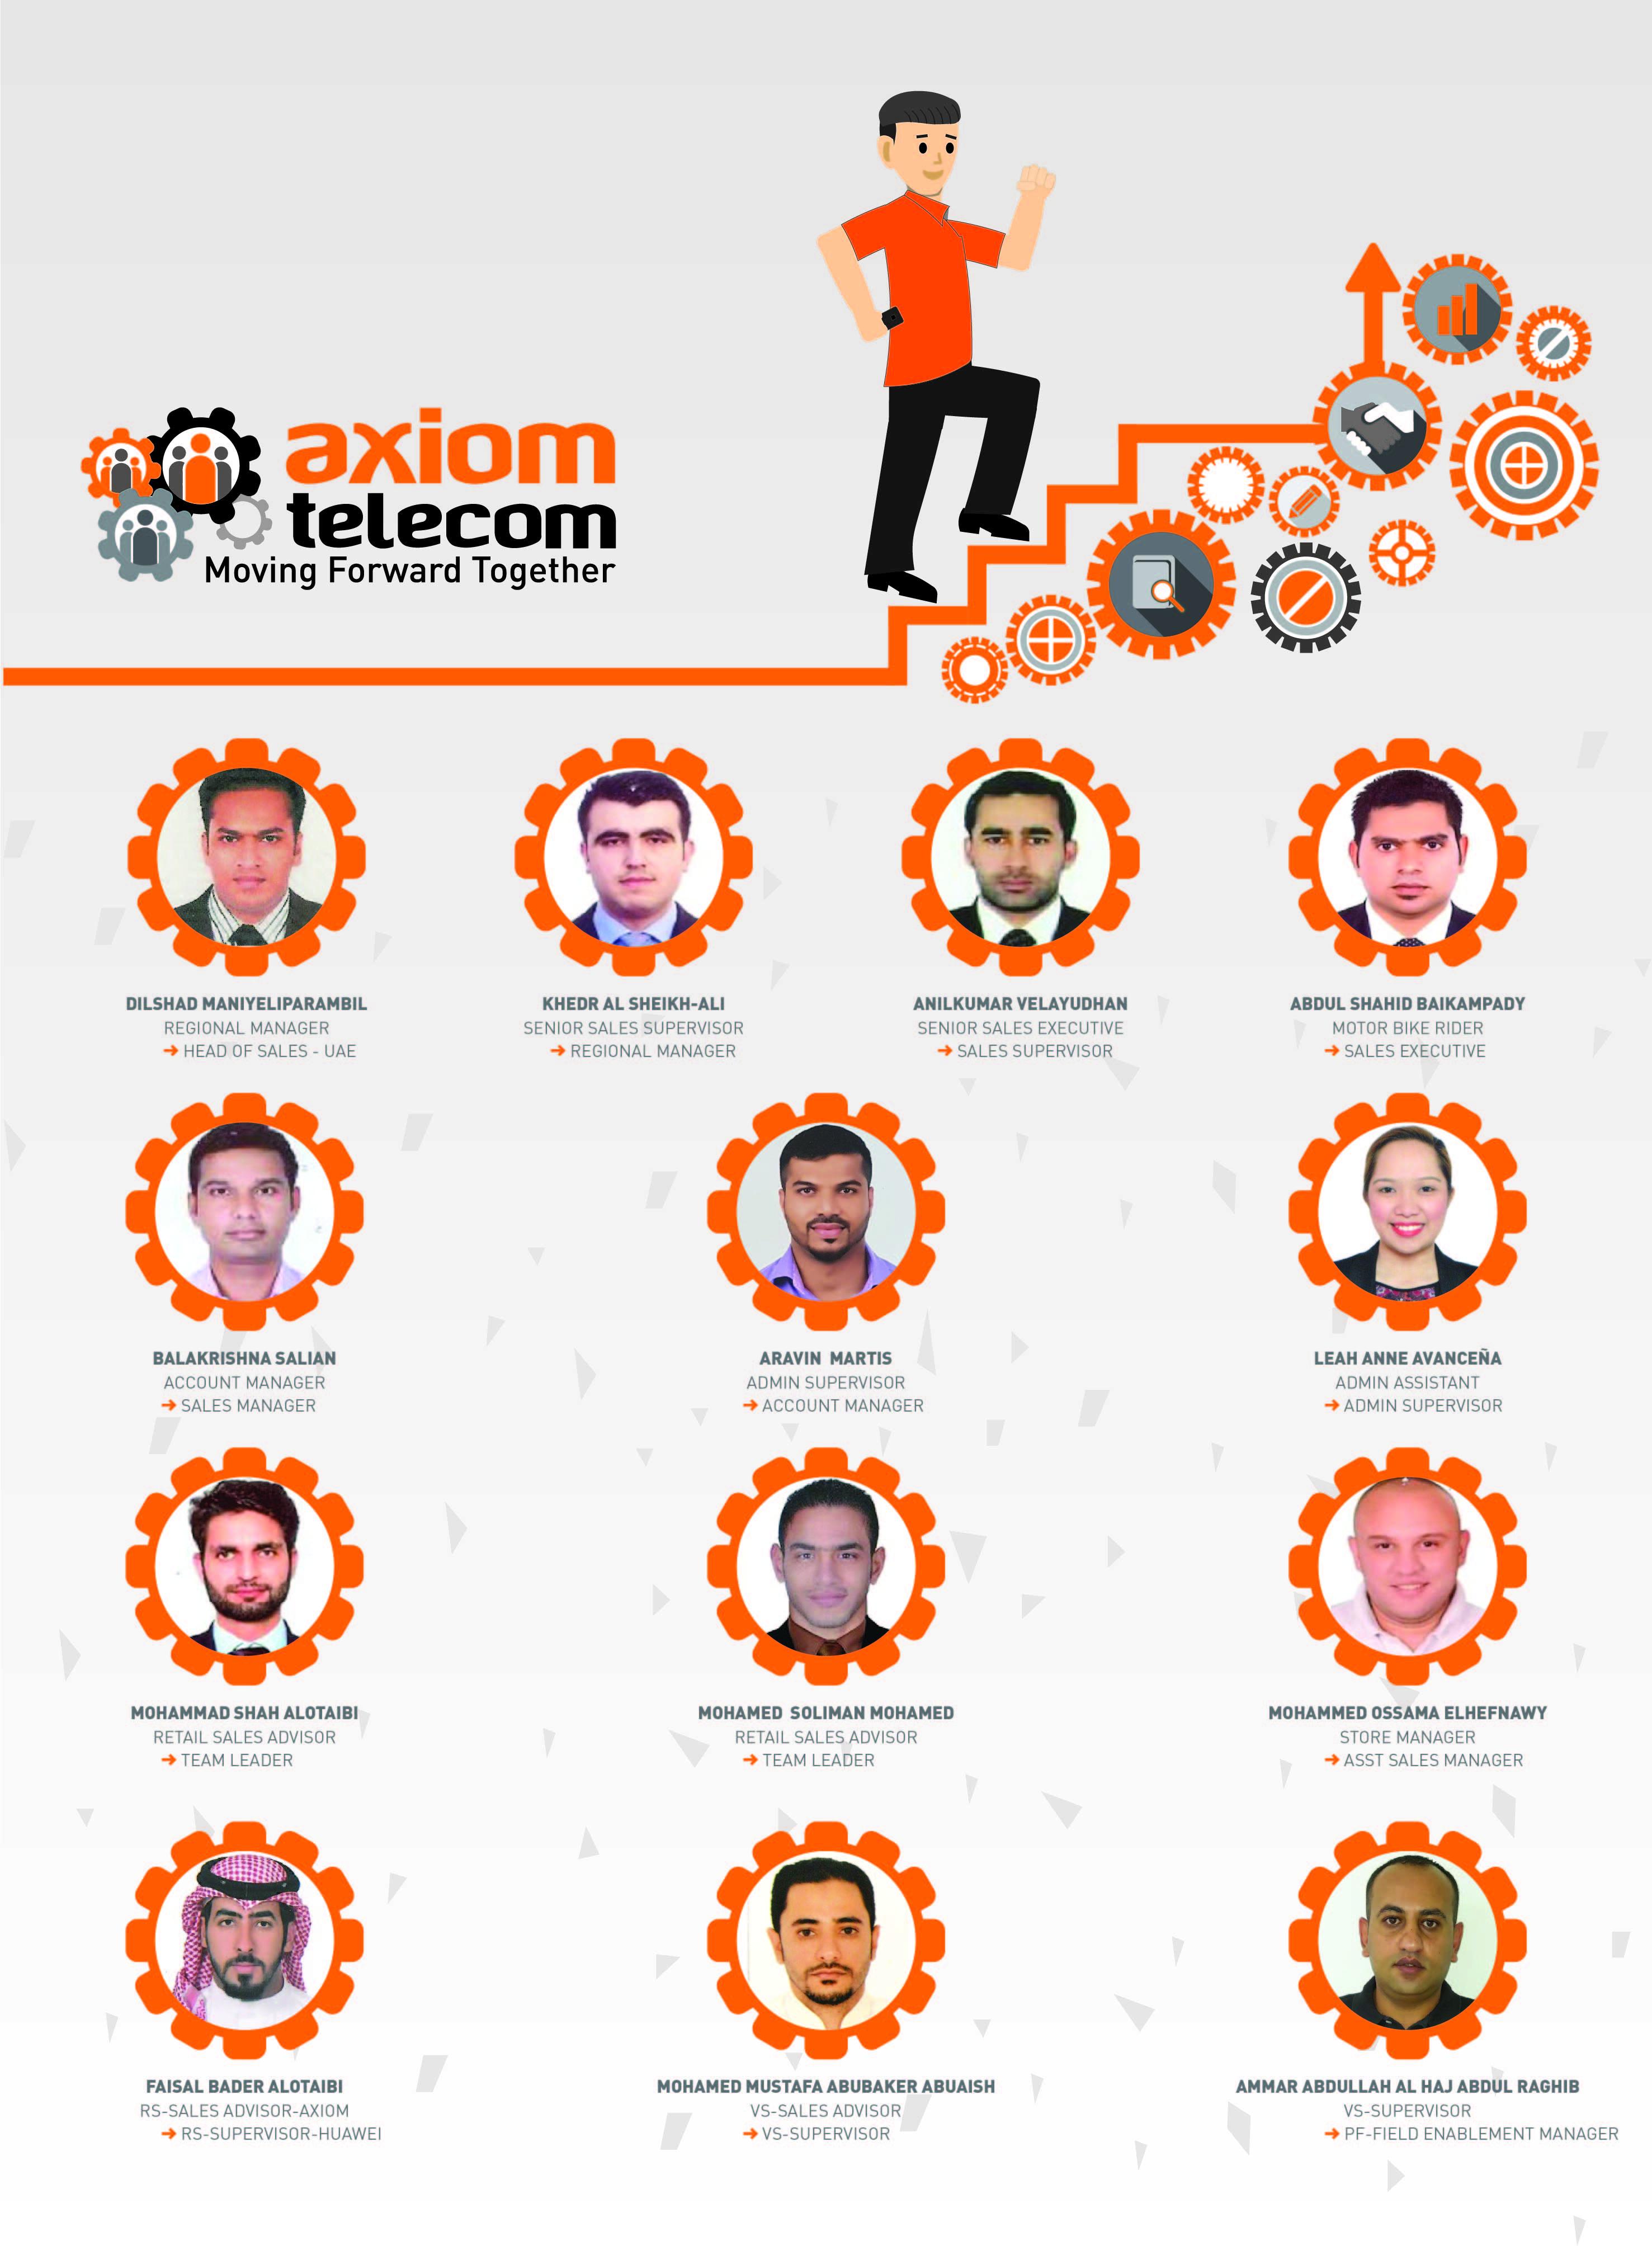 axiom-telecom-why-team